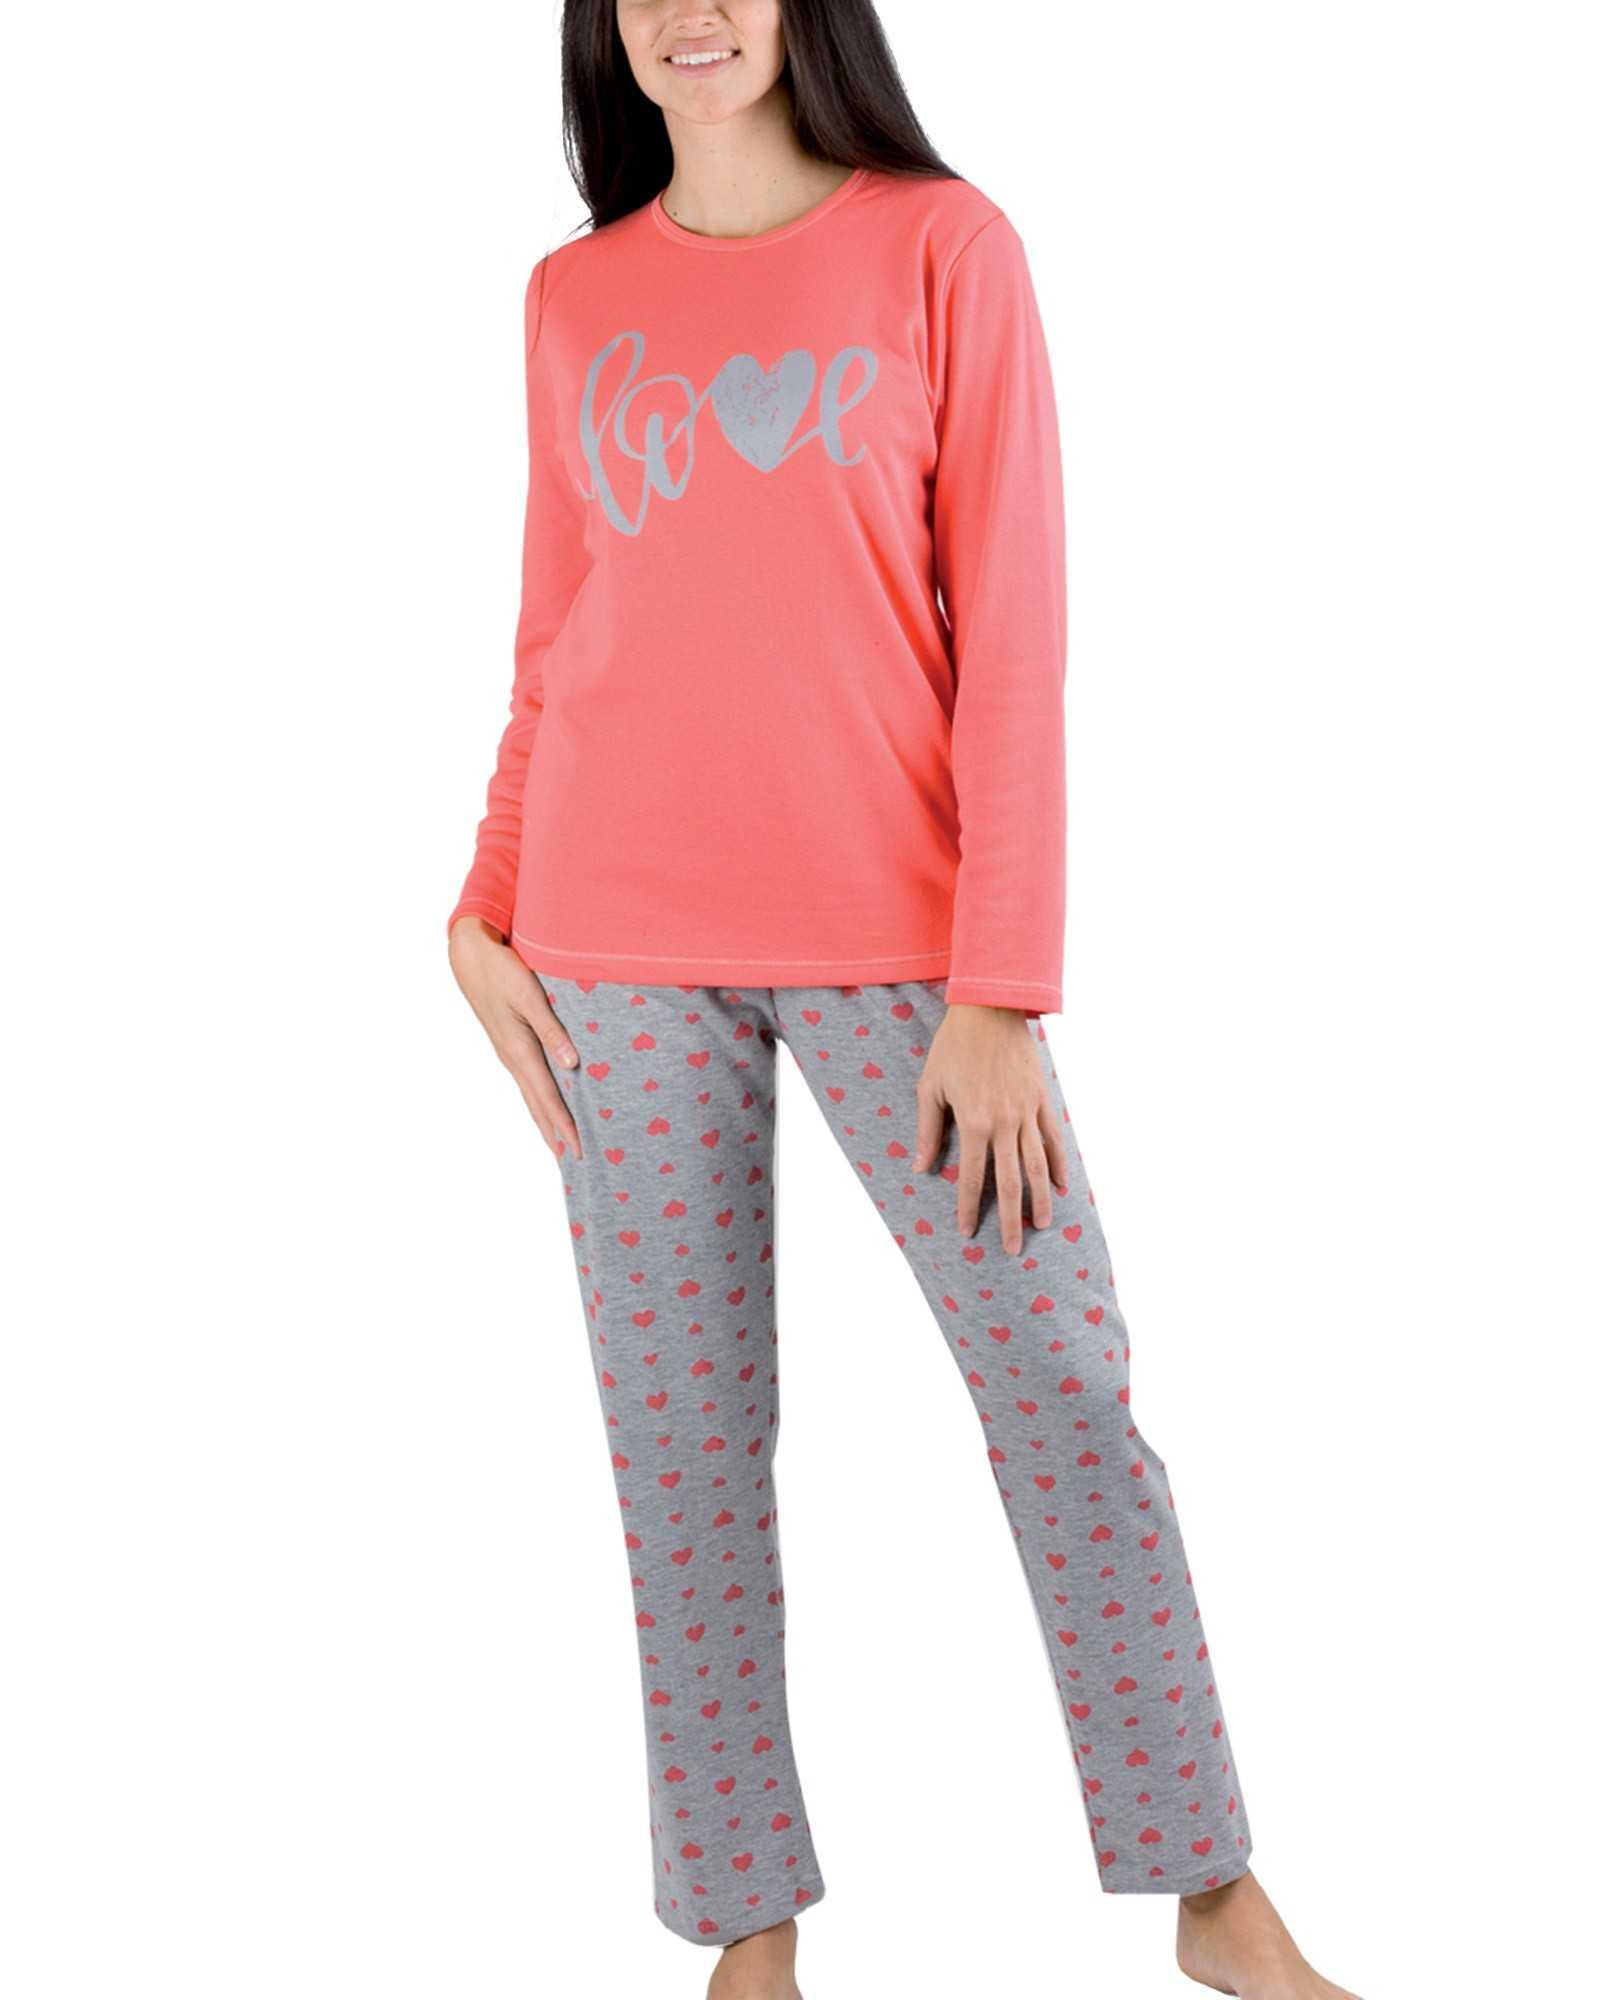 Pijama Señora Pettrus 'Love'